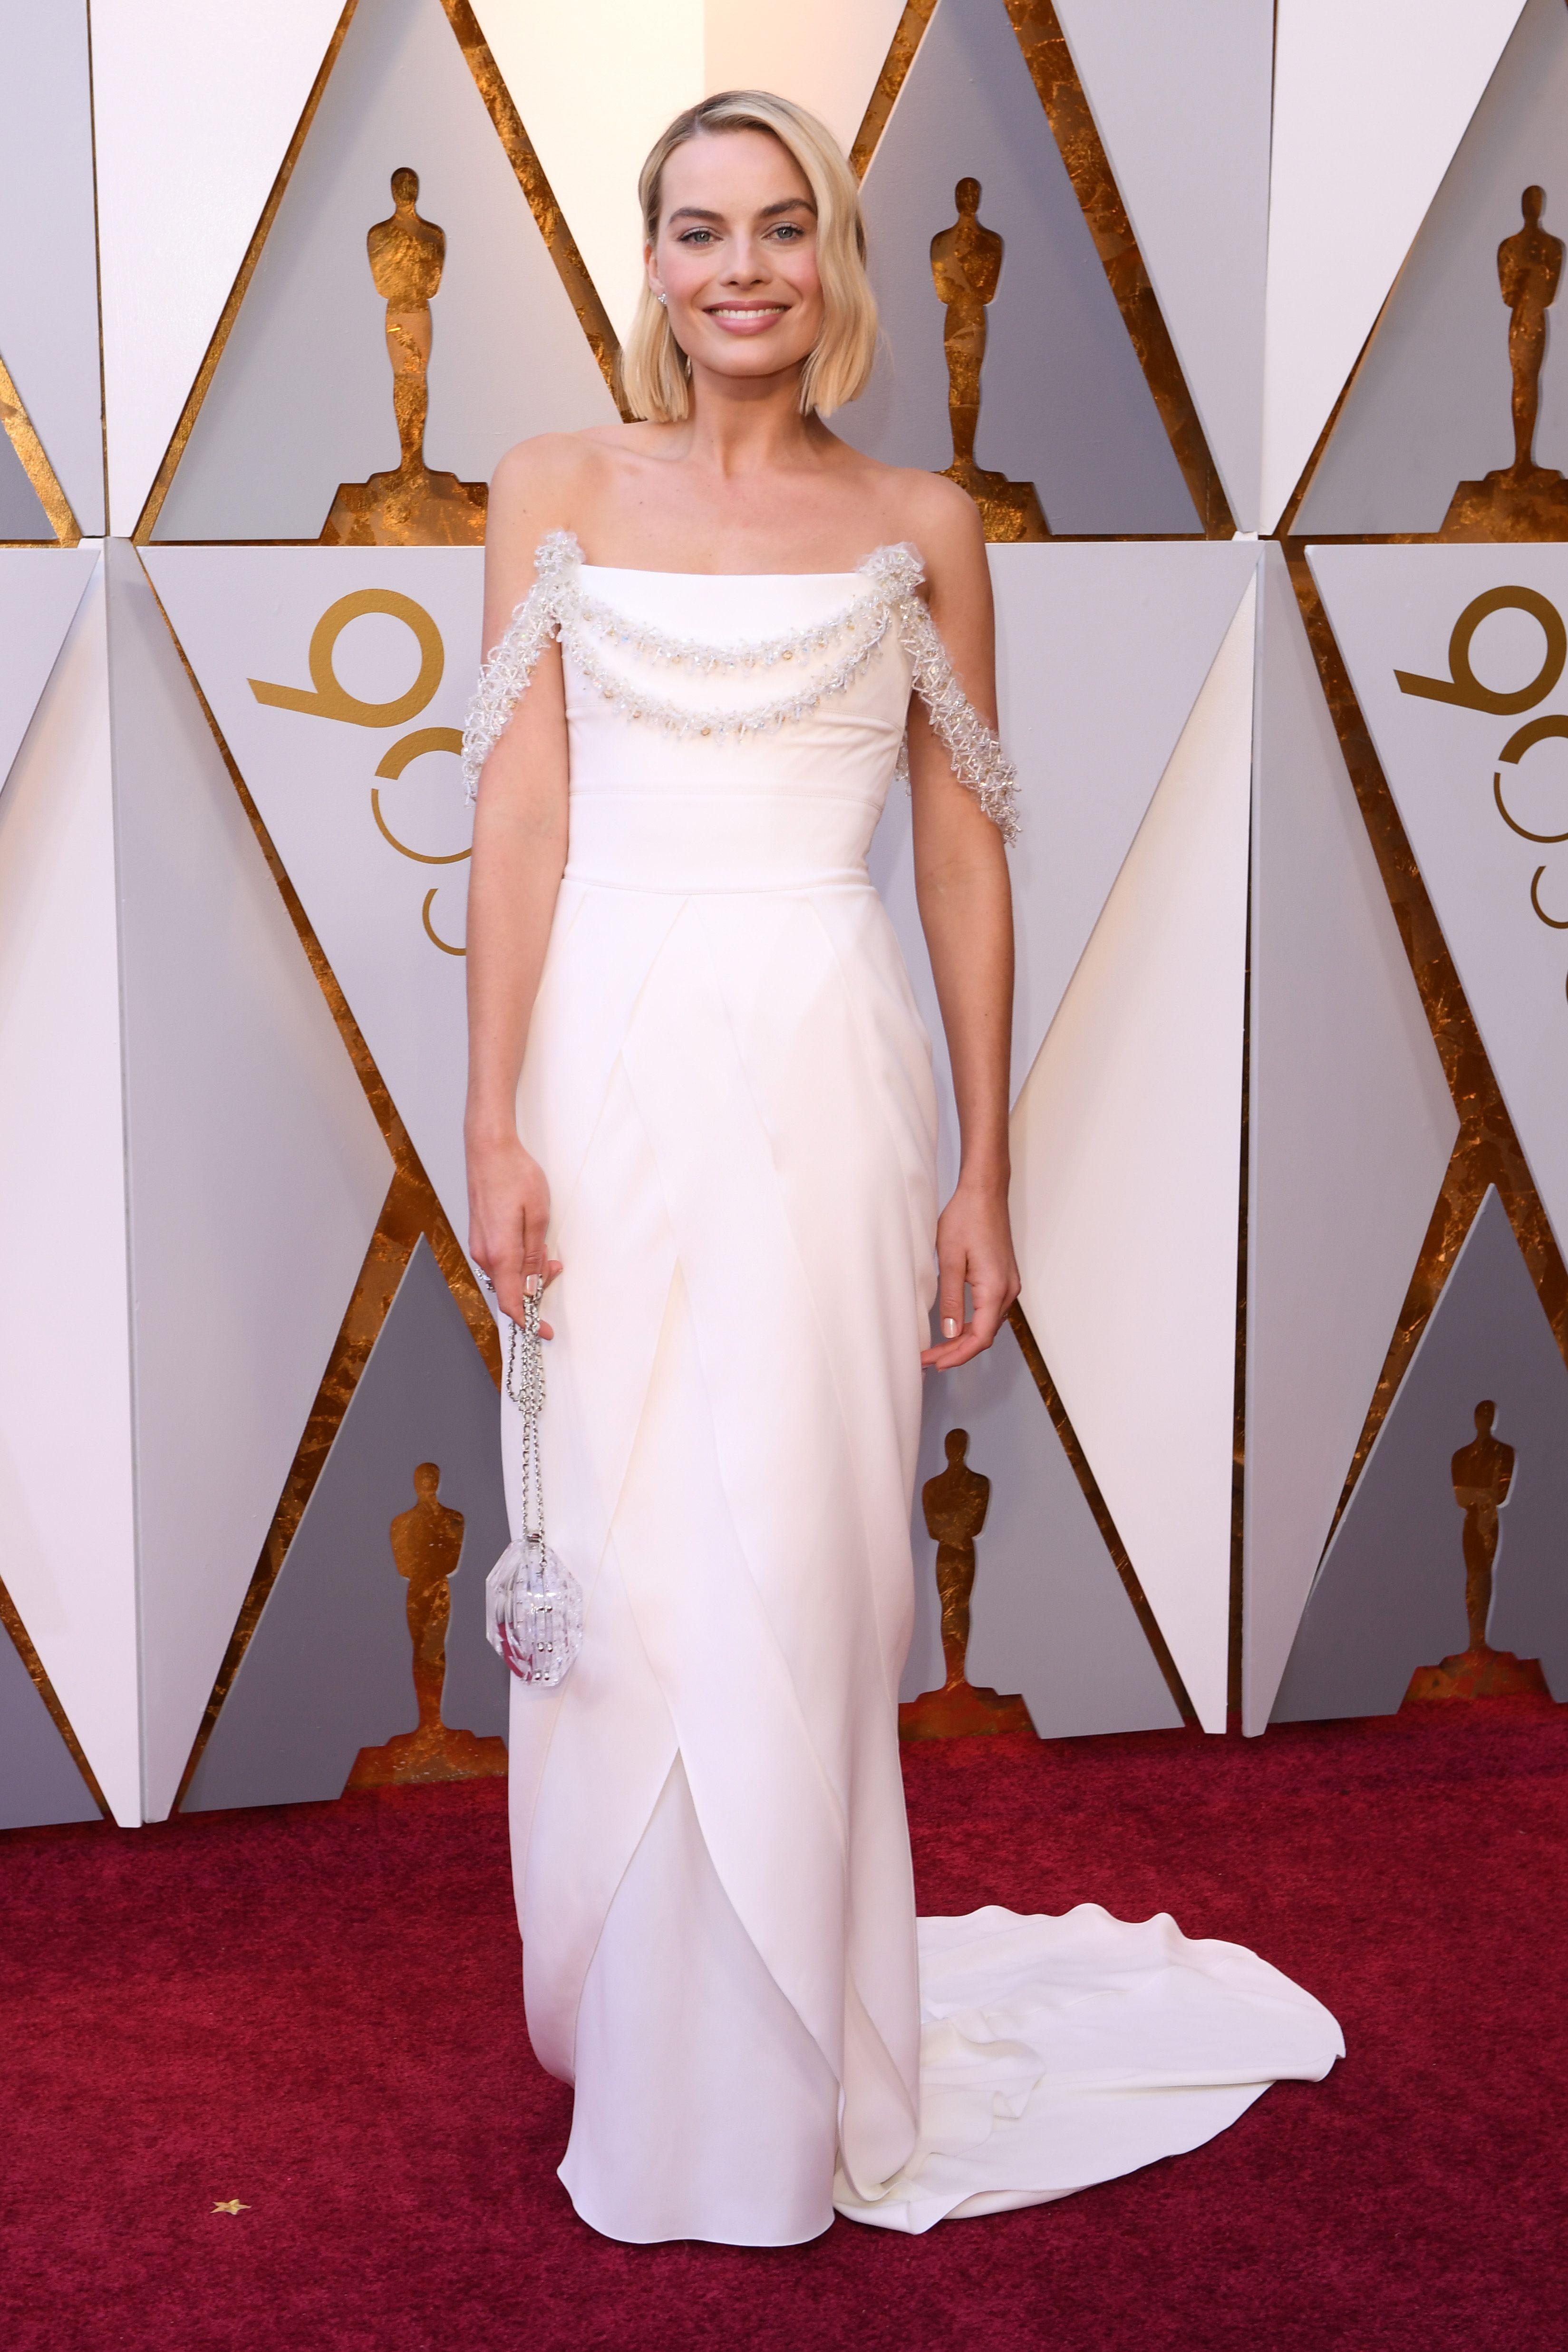 0b8151d3295 Oscars 2018 Red Carpet  Margot Robbie at the 2018 Academy Awards